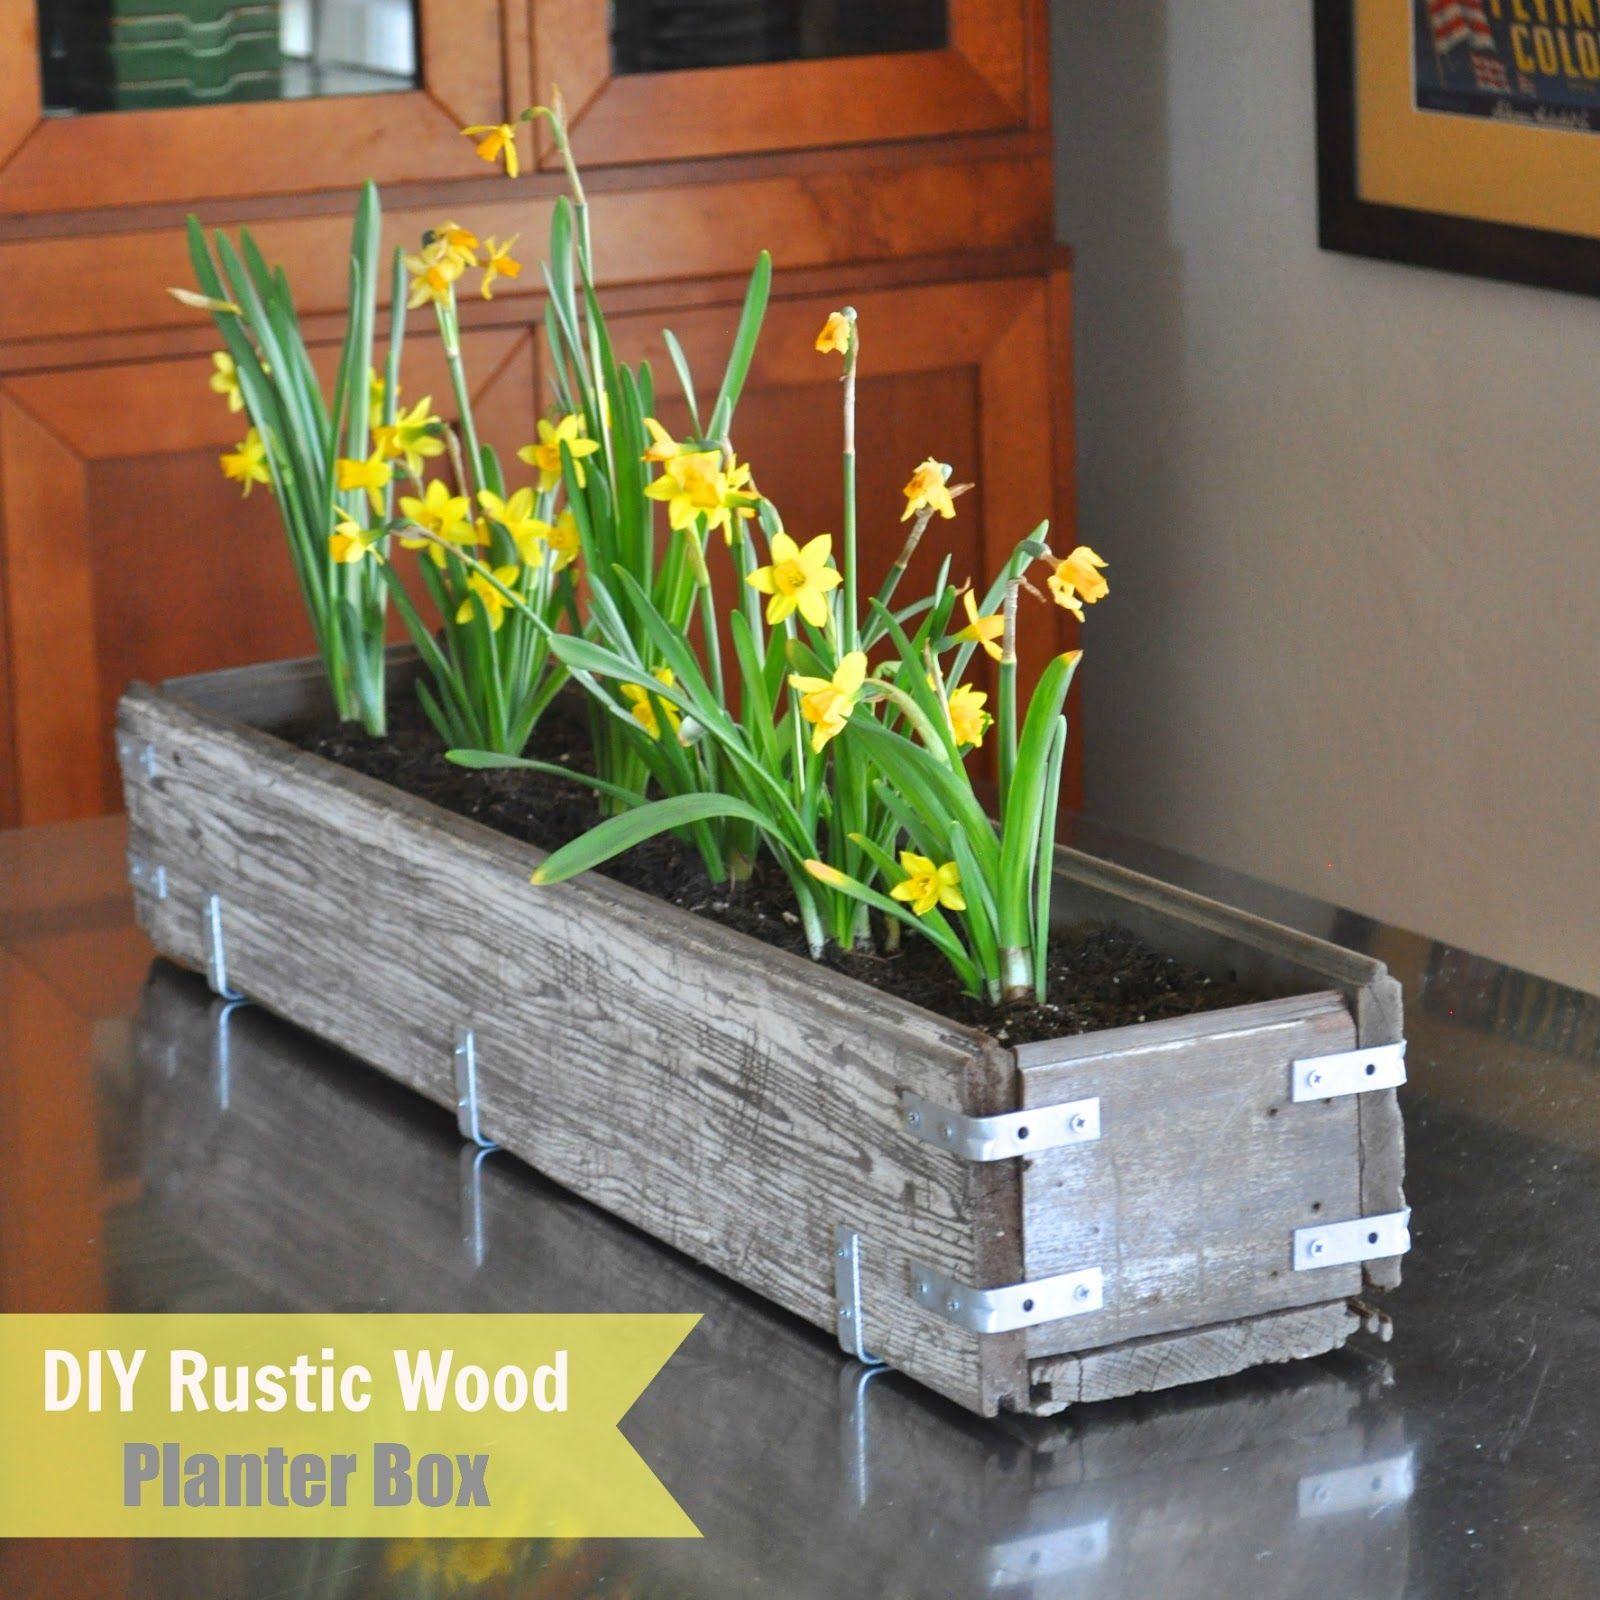 Diy Rustic Wood Planter Box Wood Planters Wooden Diy Wood Planter Box